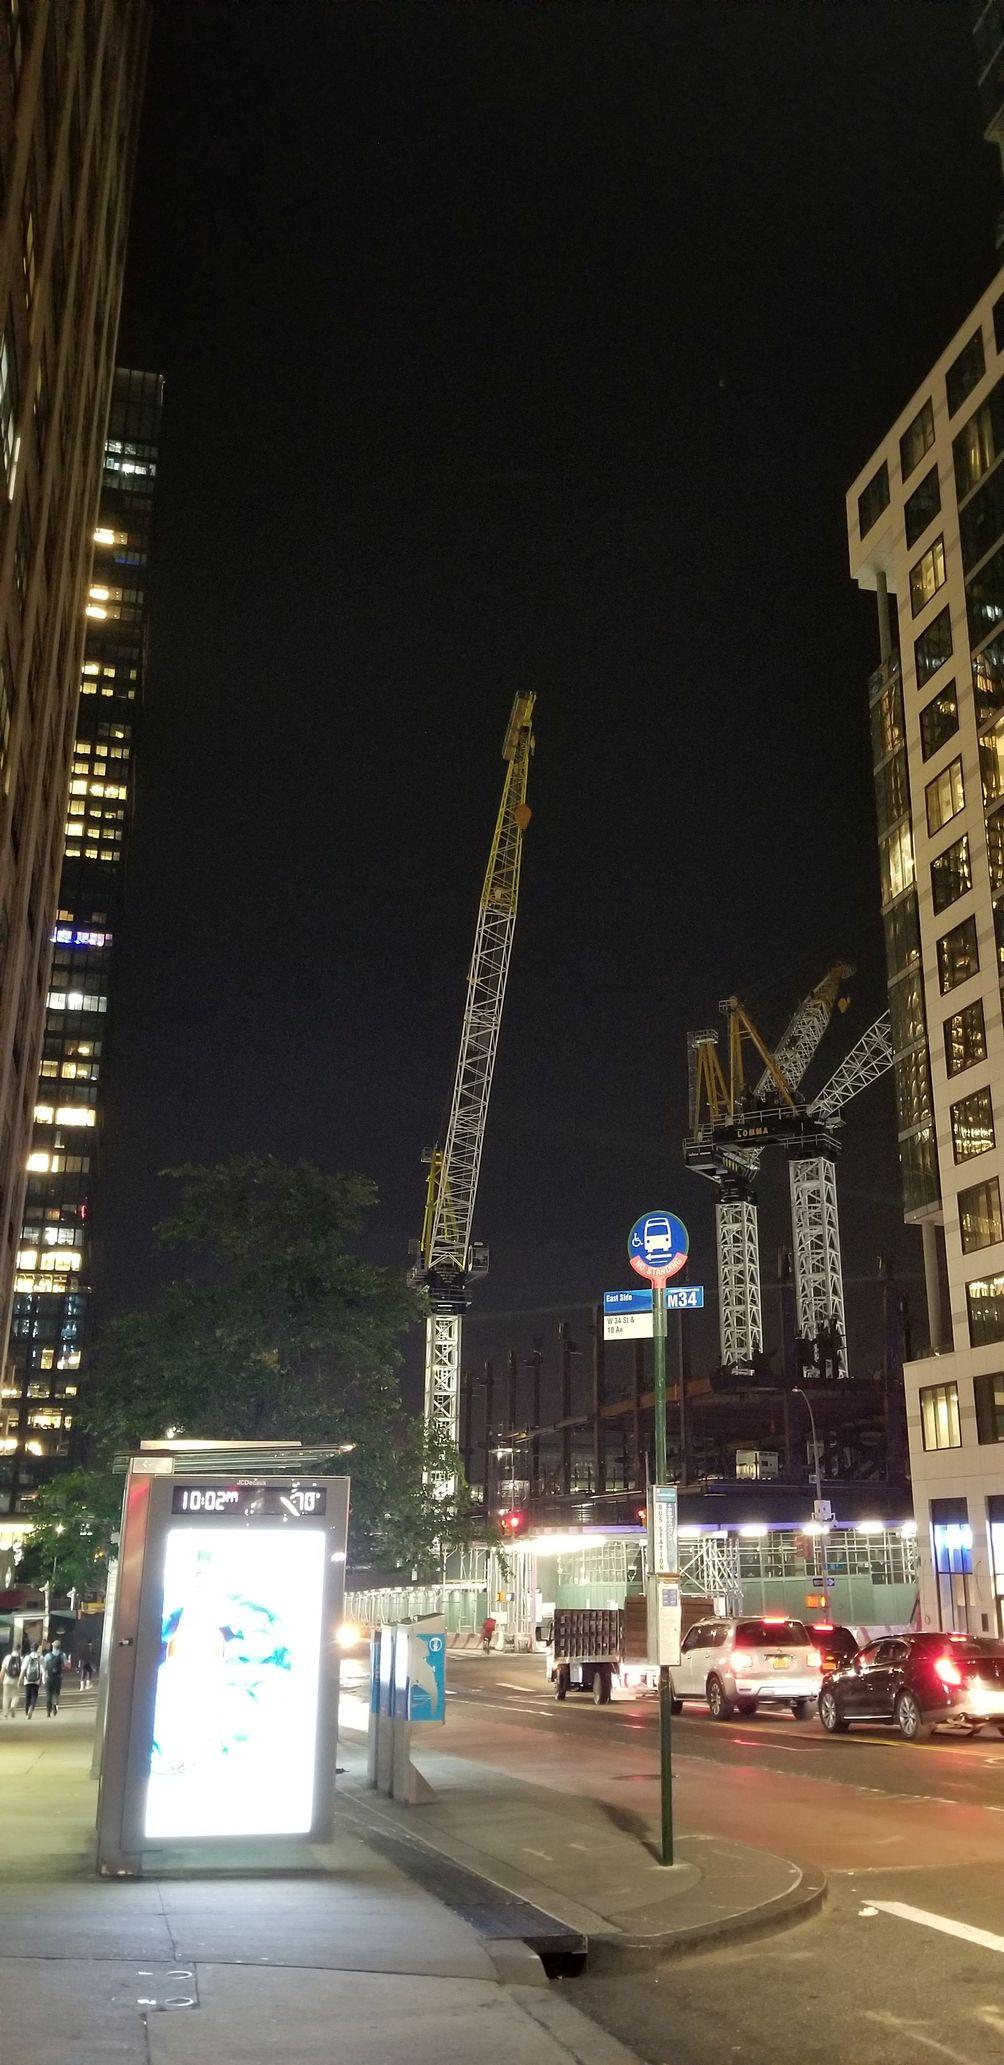 The Spiral, 35 Hudson Yards, Vitali Ogorodnikov, Hudson Yards, Hudson Boulevard, office, New York, skyline, skyscraper, construction, update, city, night, 34th Street